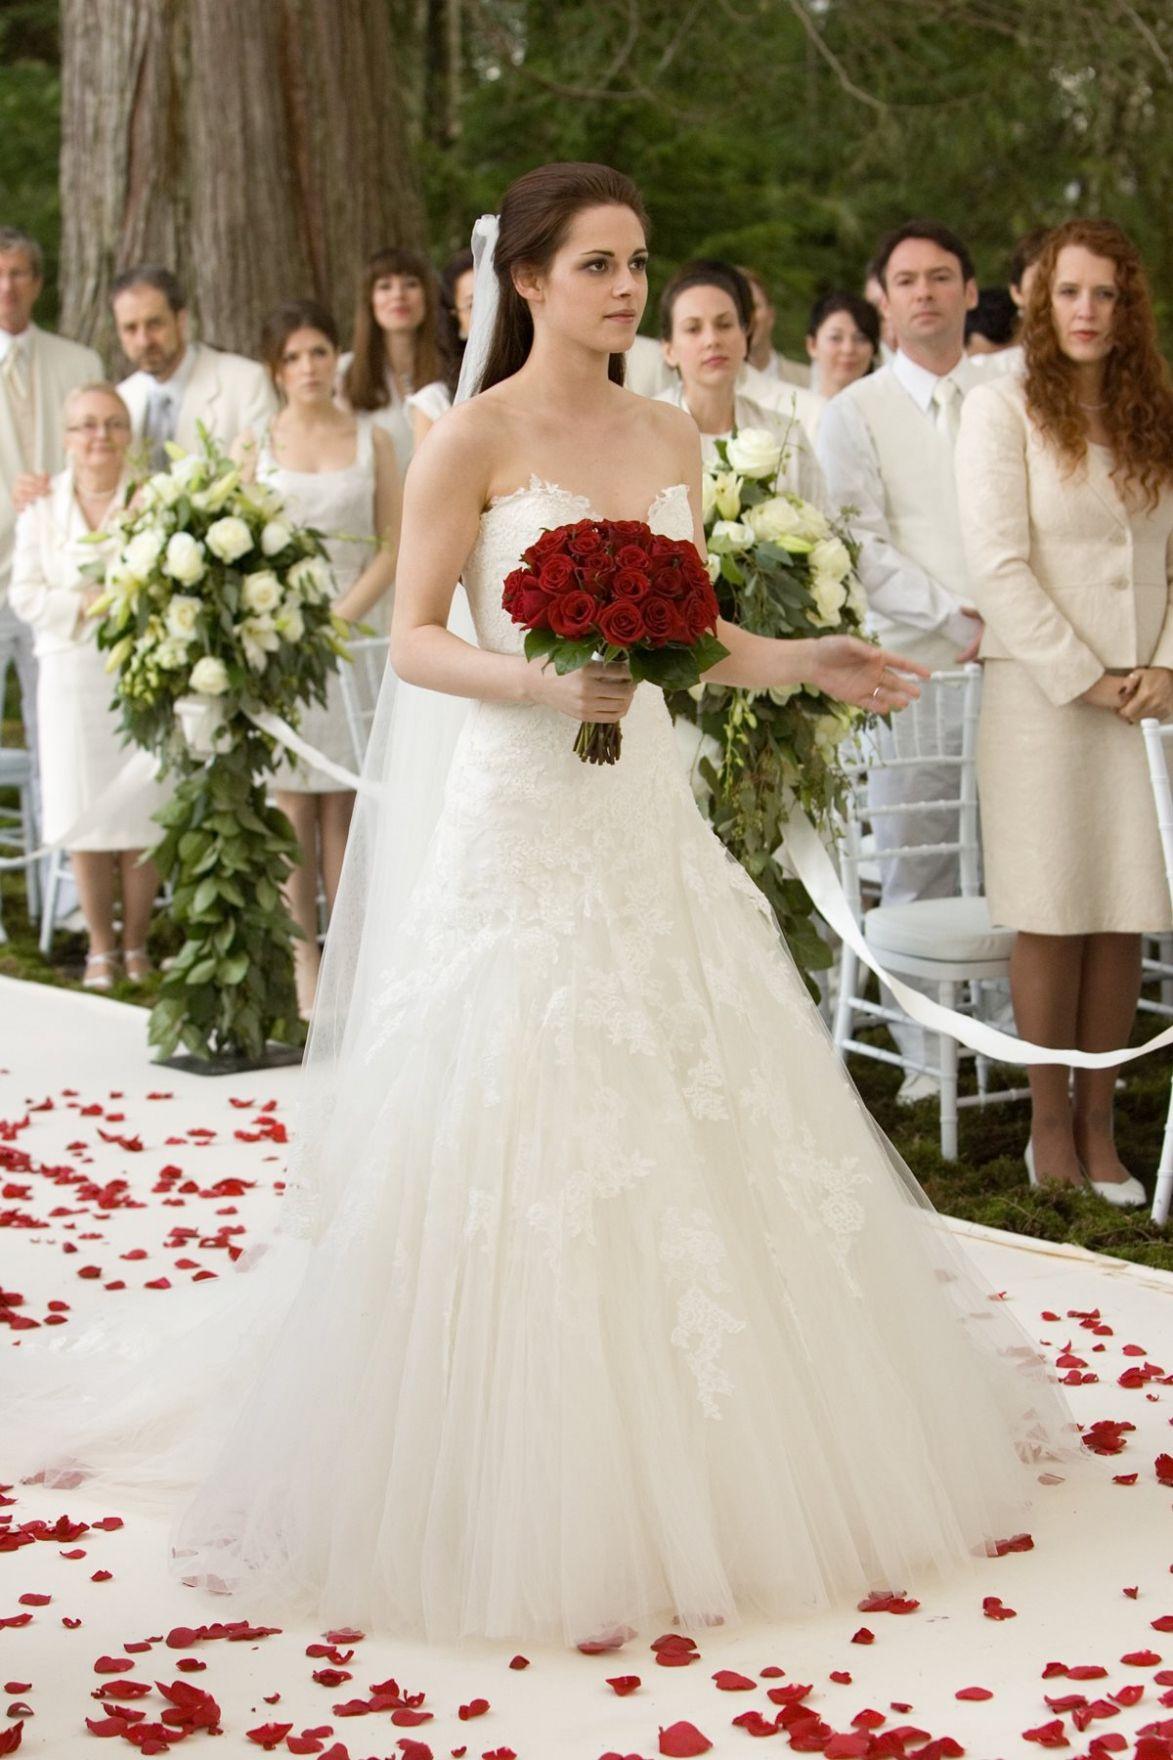 Bella Wedding Dress for Sale  Plus Size Dresses for Wedding